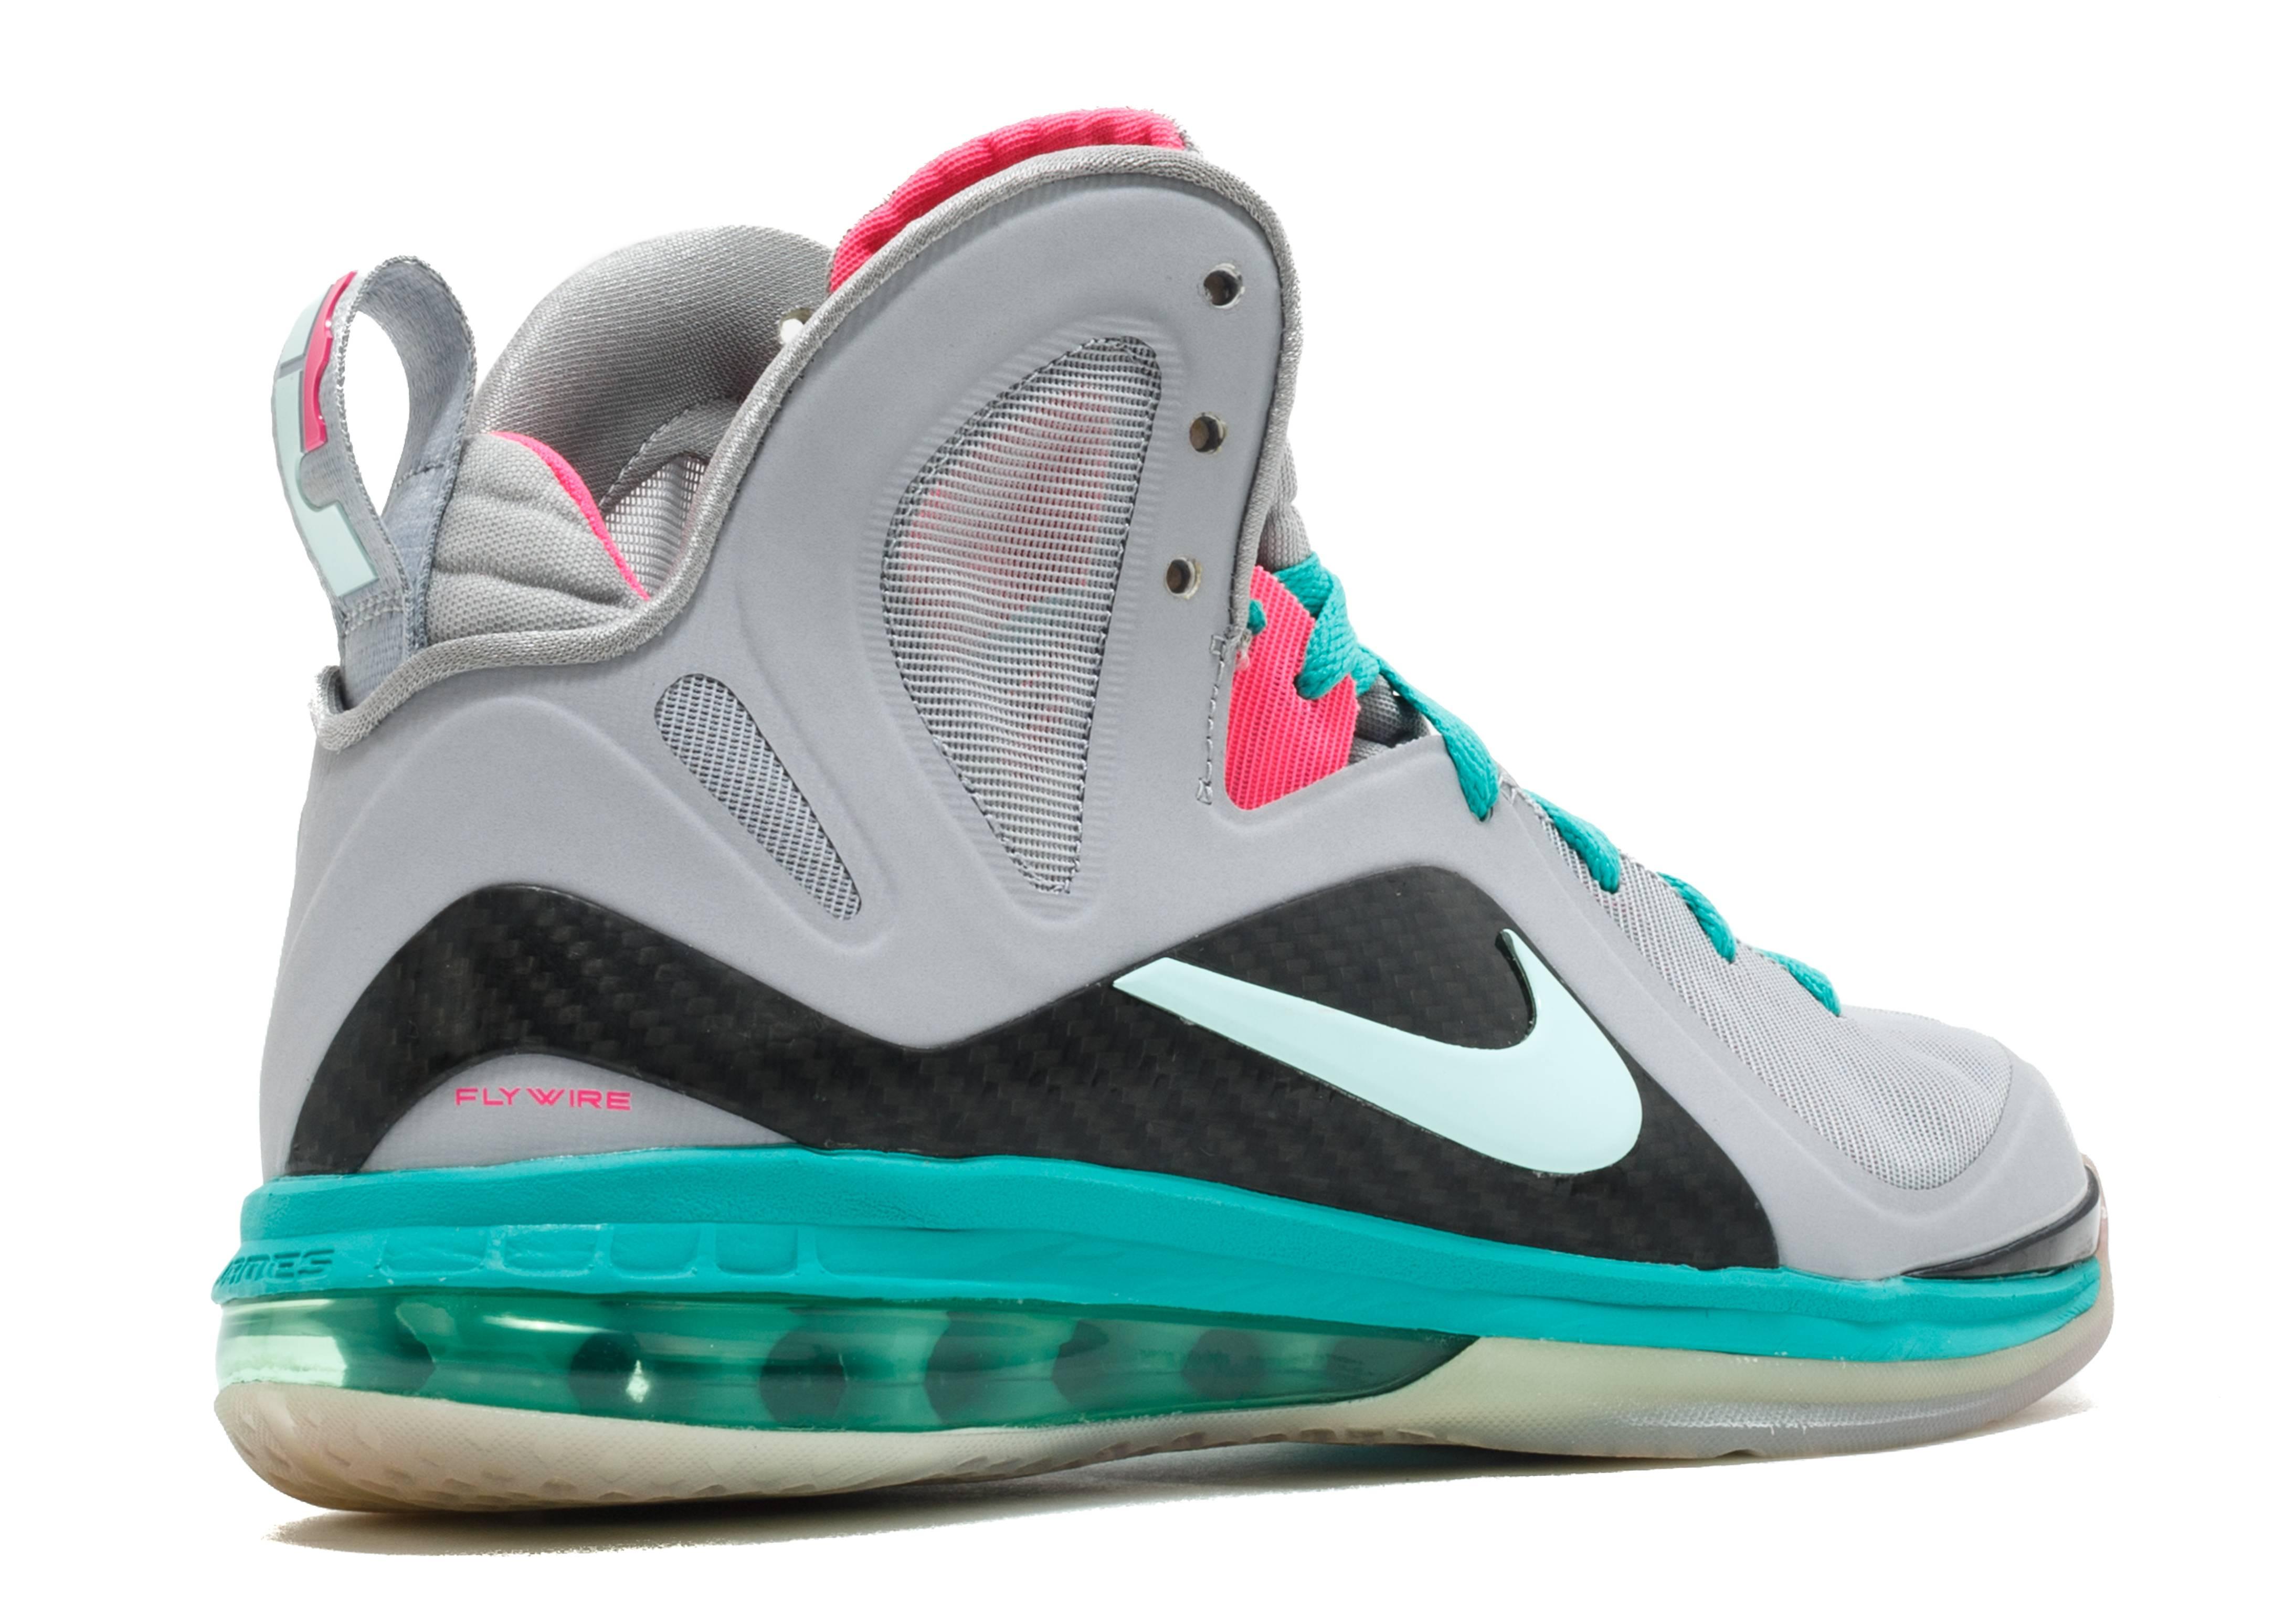 Maestro capi di abbigliamento cucina  LeBron 9 P.S. Elite 'South Beach' - Nike - 516958 001 - wolf grey/mint  candy-new green-pink flash | Flight Club